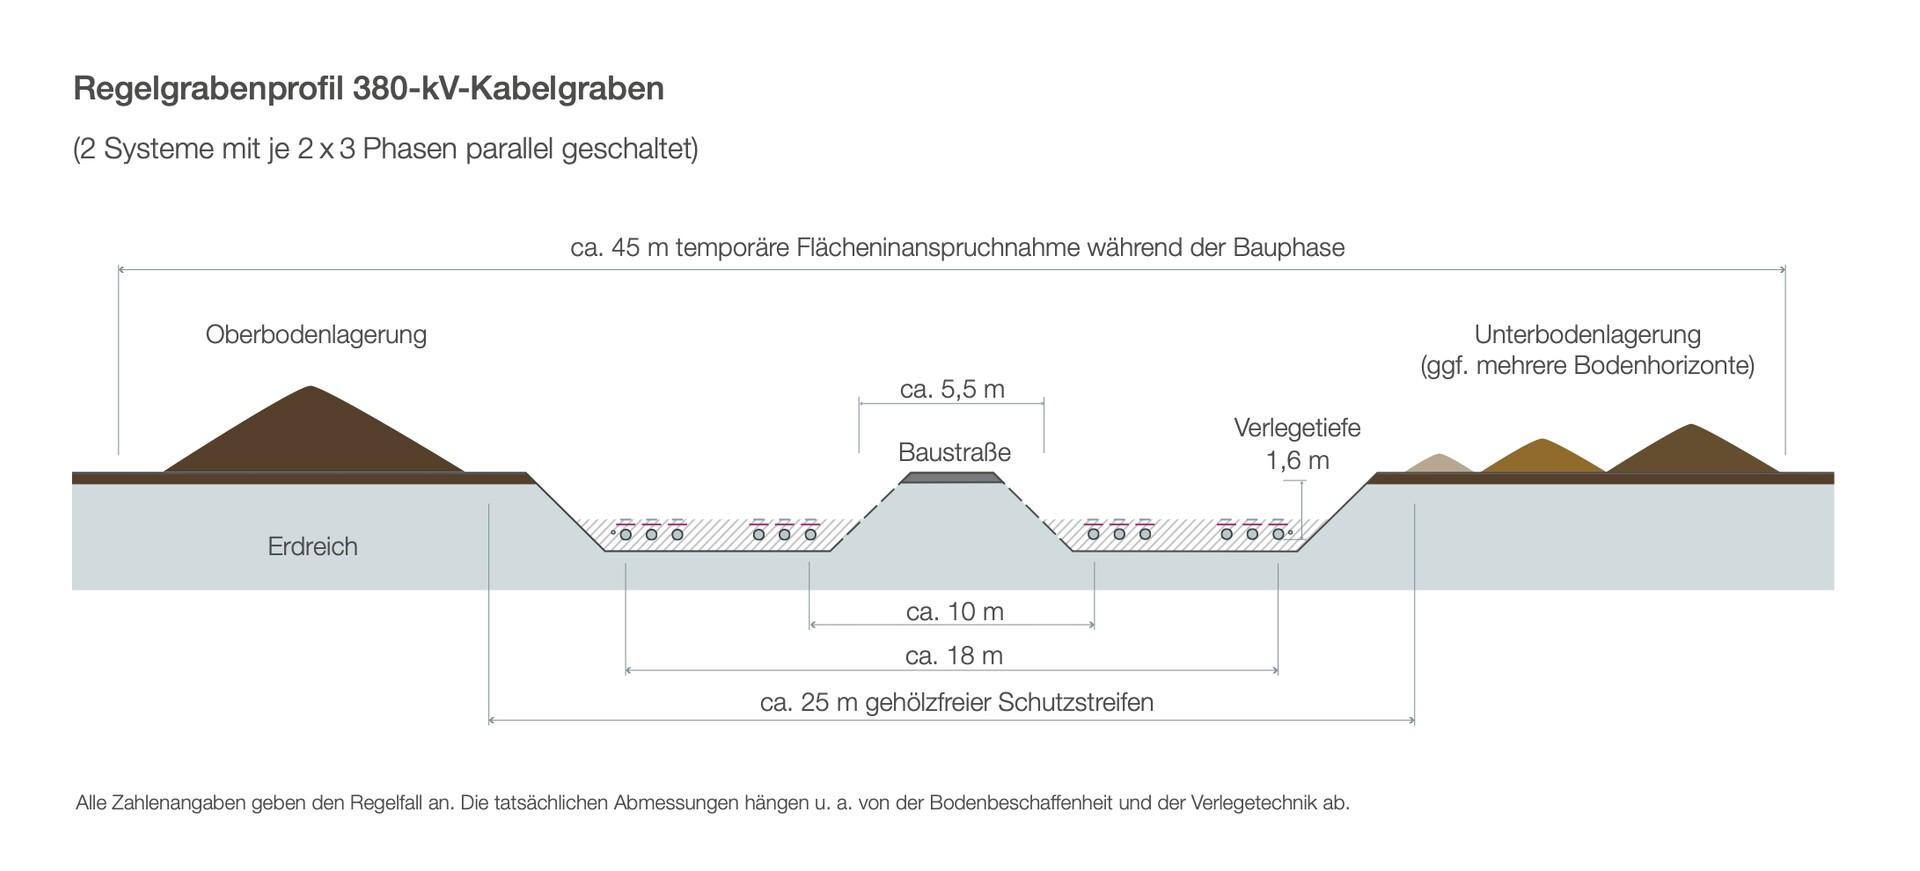 Regelgrabenprofil 380-kV-Kabelgraben